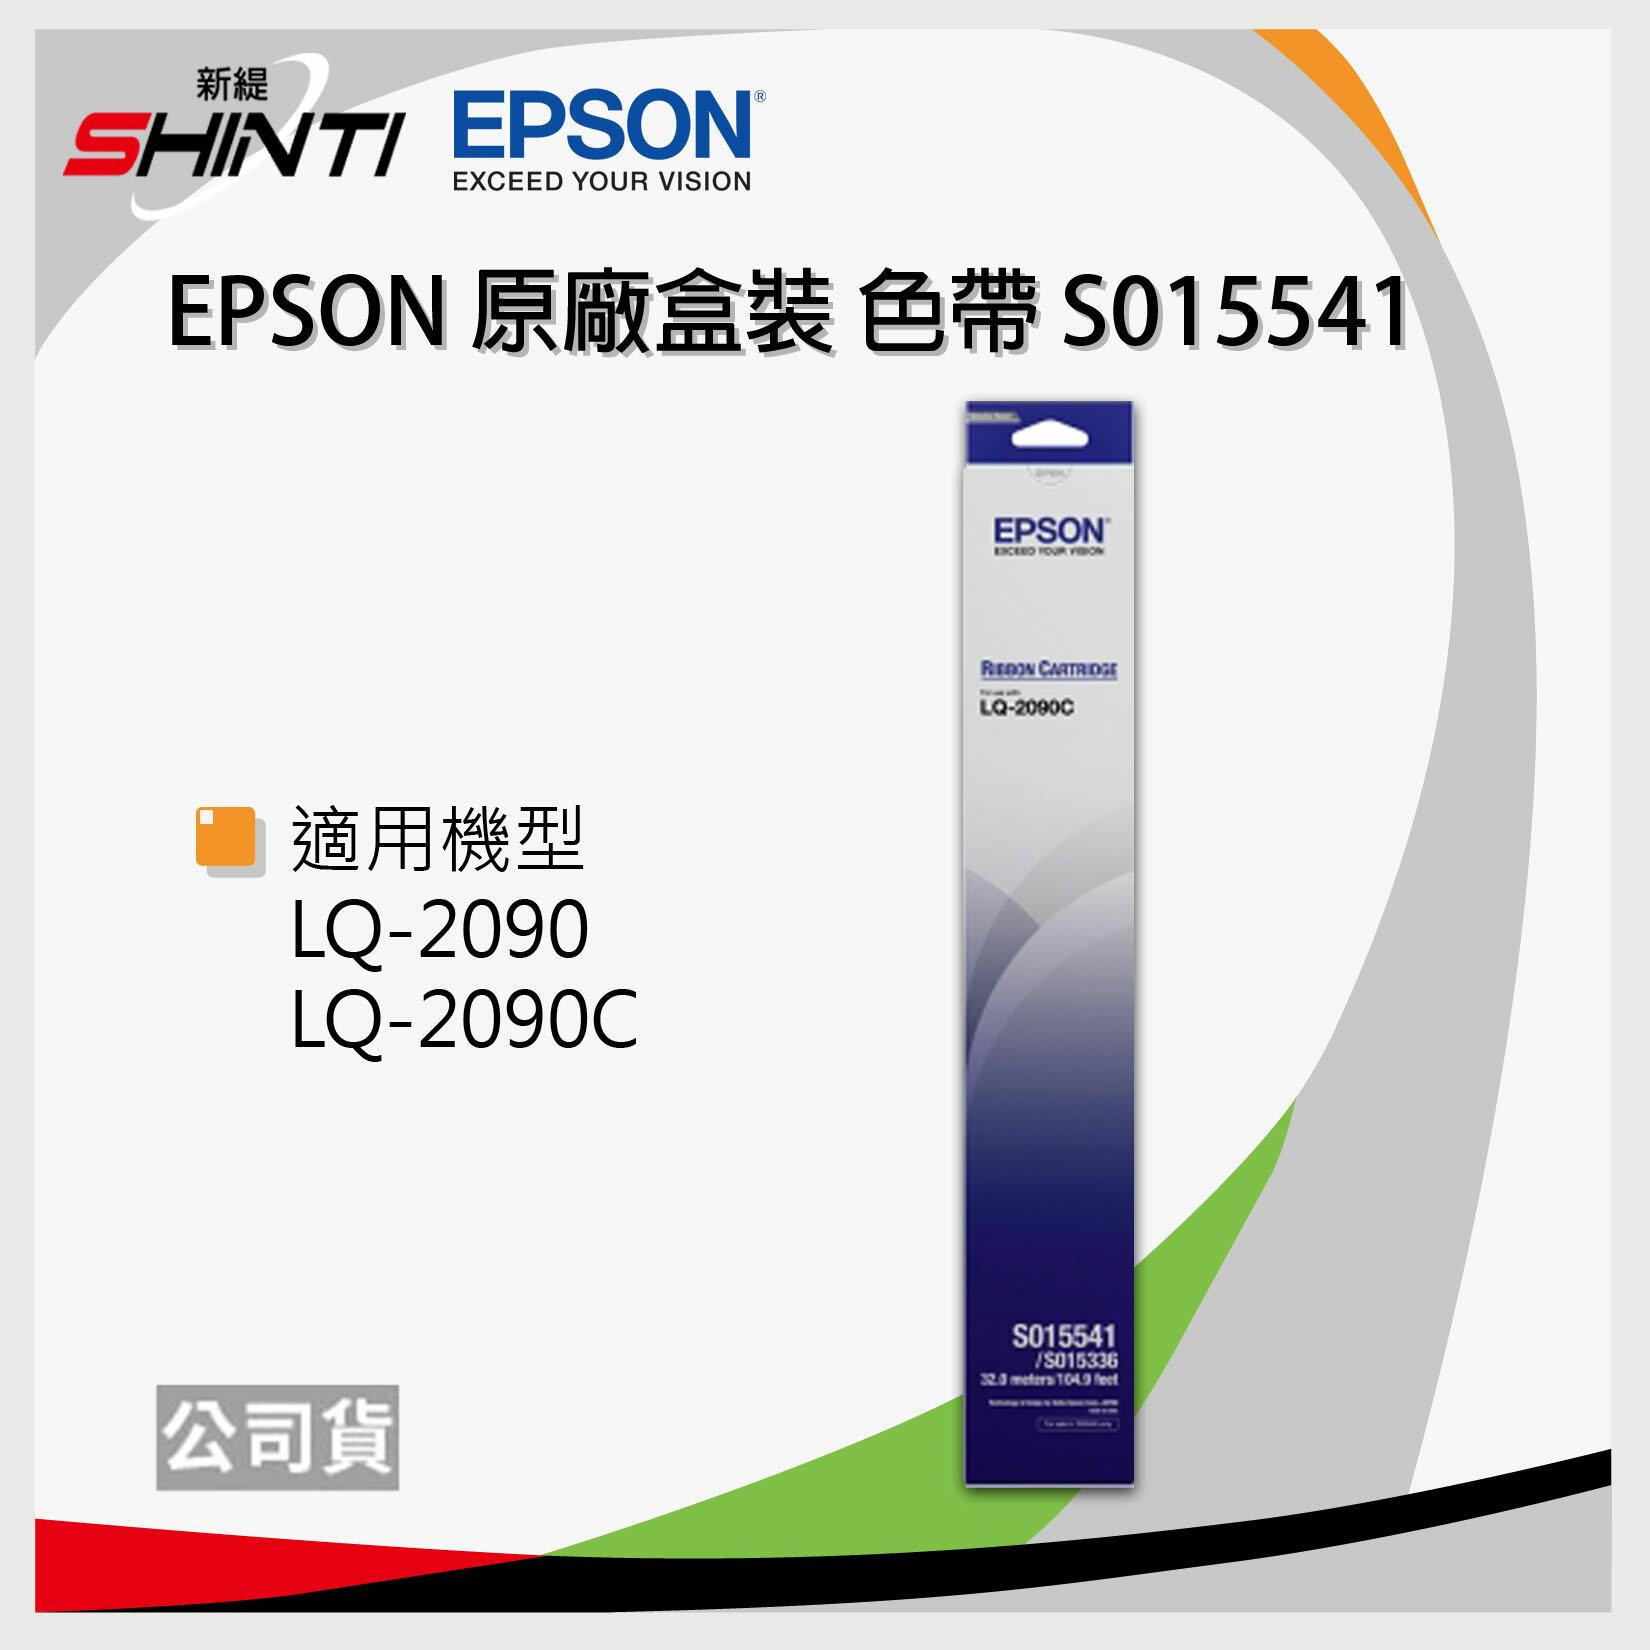 【單支】Epson LQ-2090 / LQ-2090C 原廠黑色色帶 S015541 / S015336